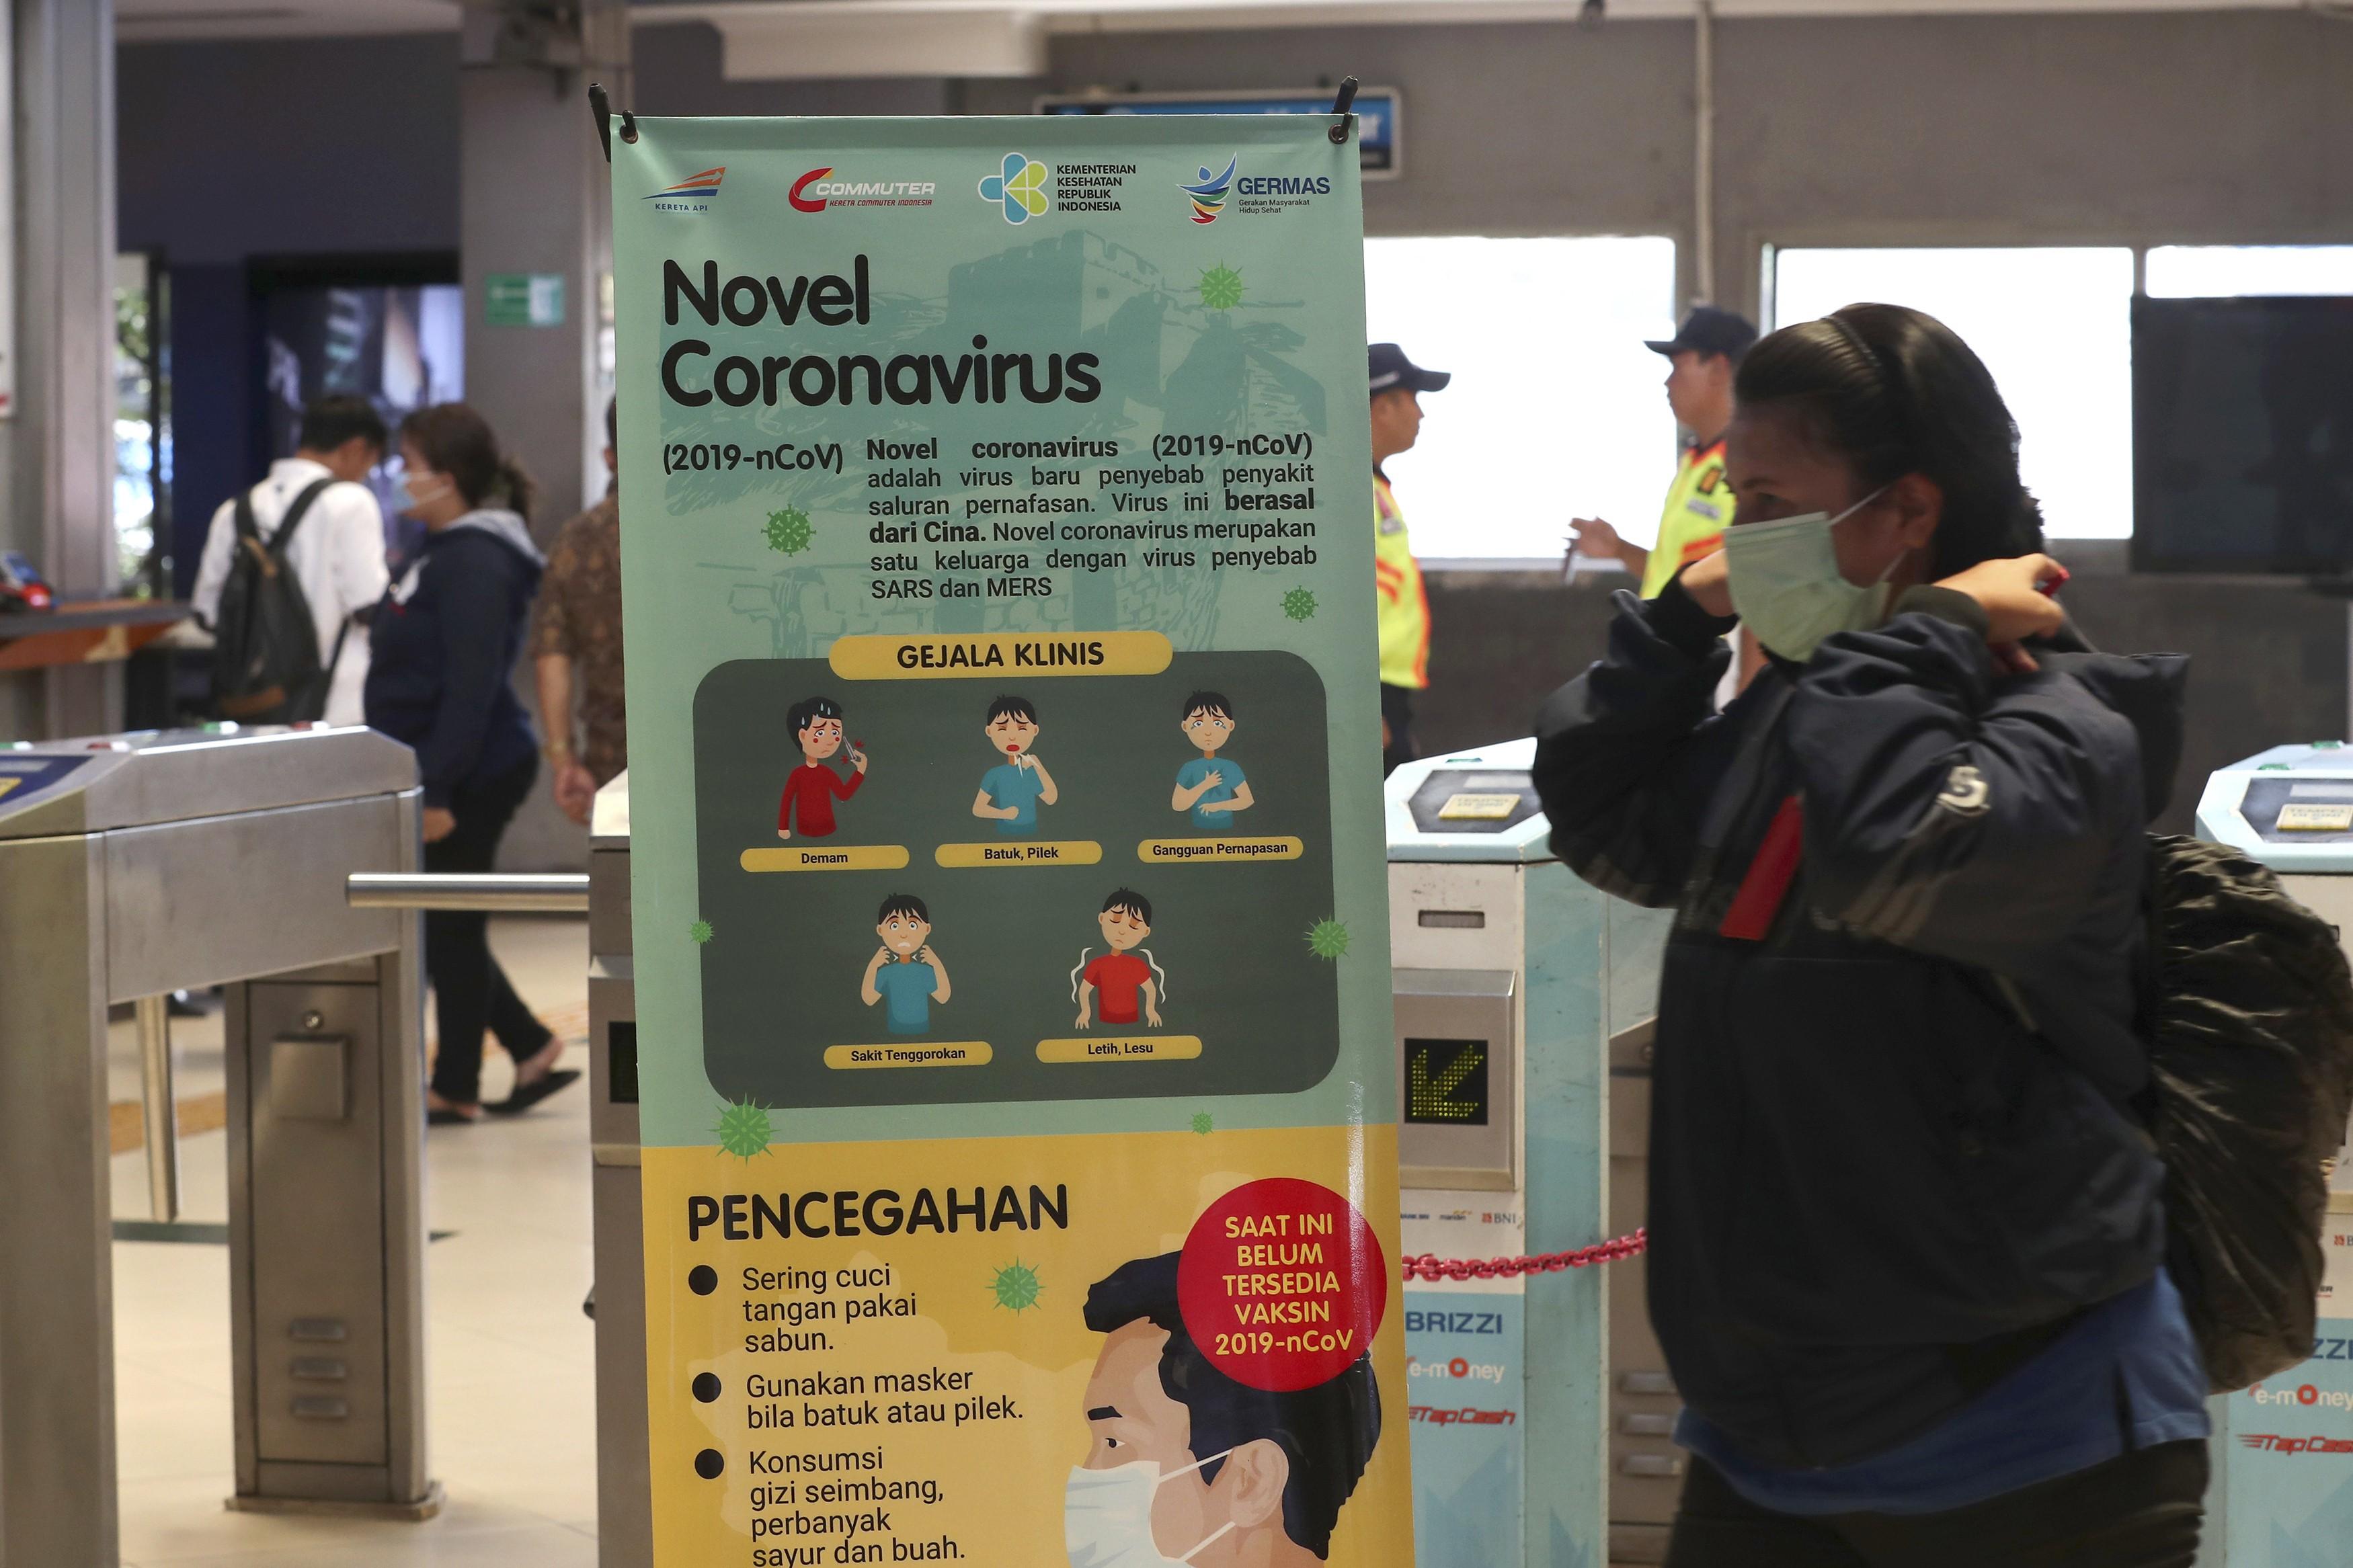 Aumento de casos de covid-19 na Indonésia amplia temores sobre variante Delta